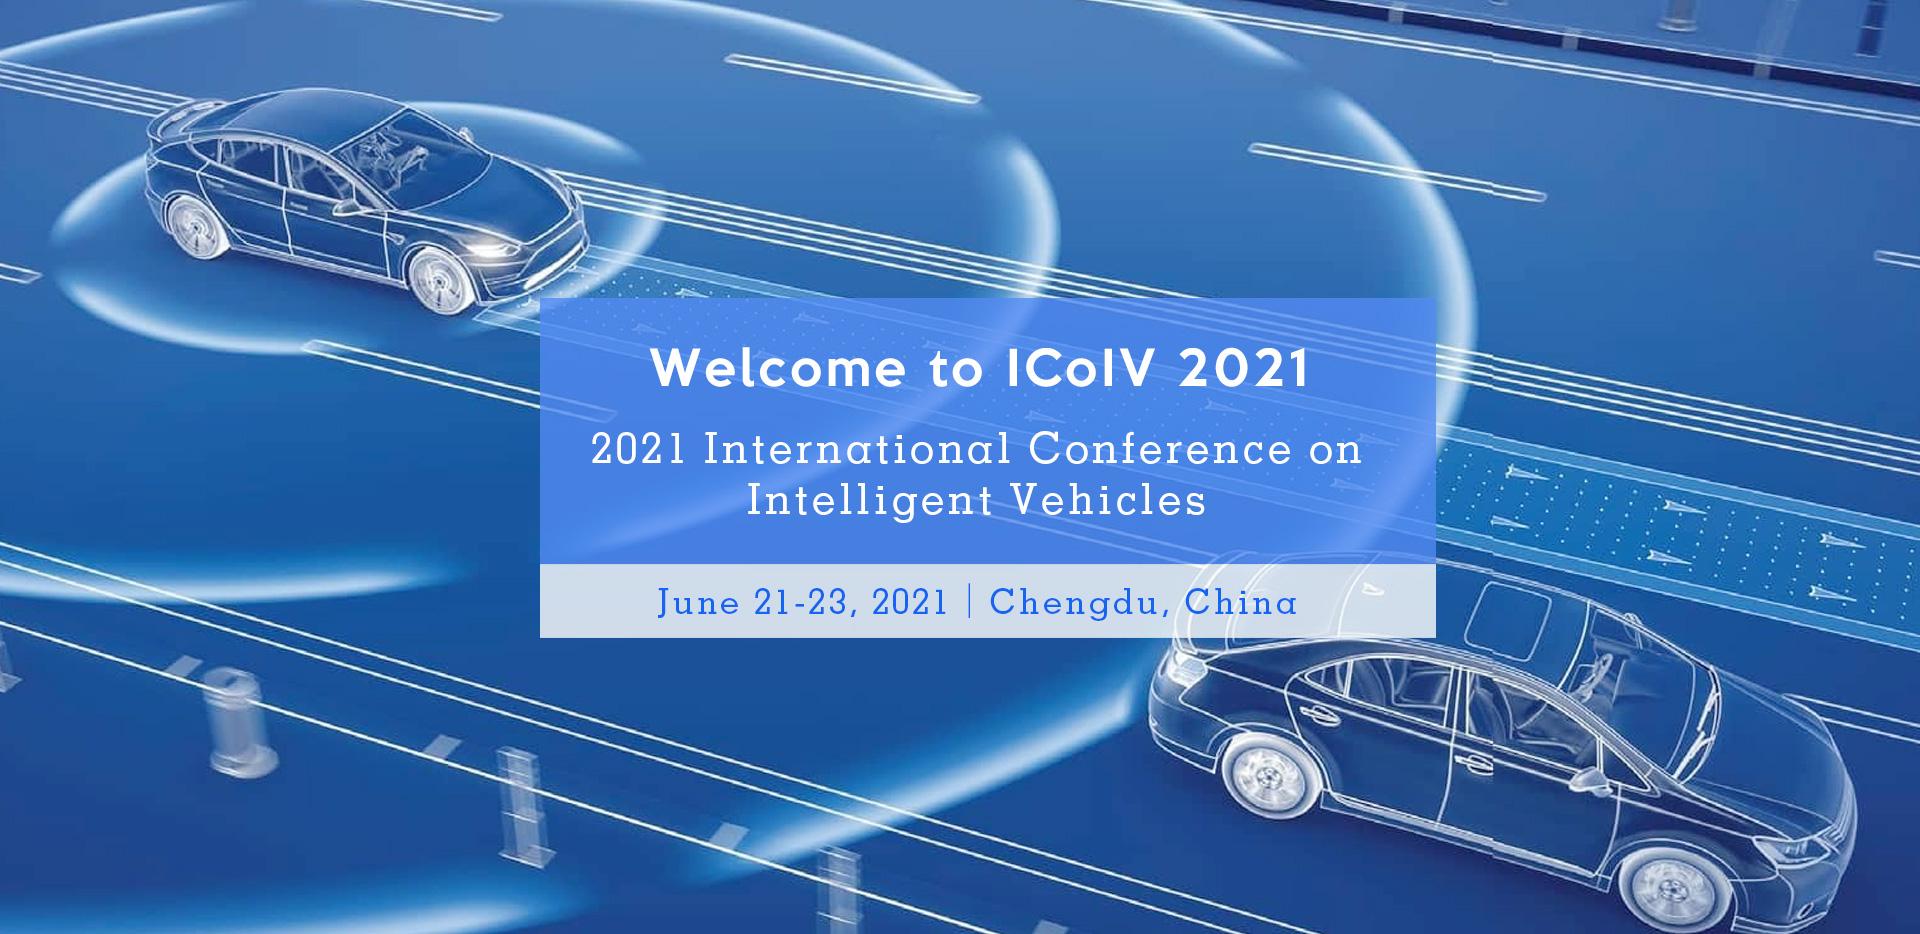 2021 International Conference on Intelligent Vehicles (ICoIV 2021)